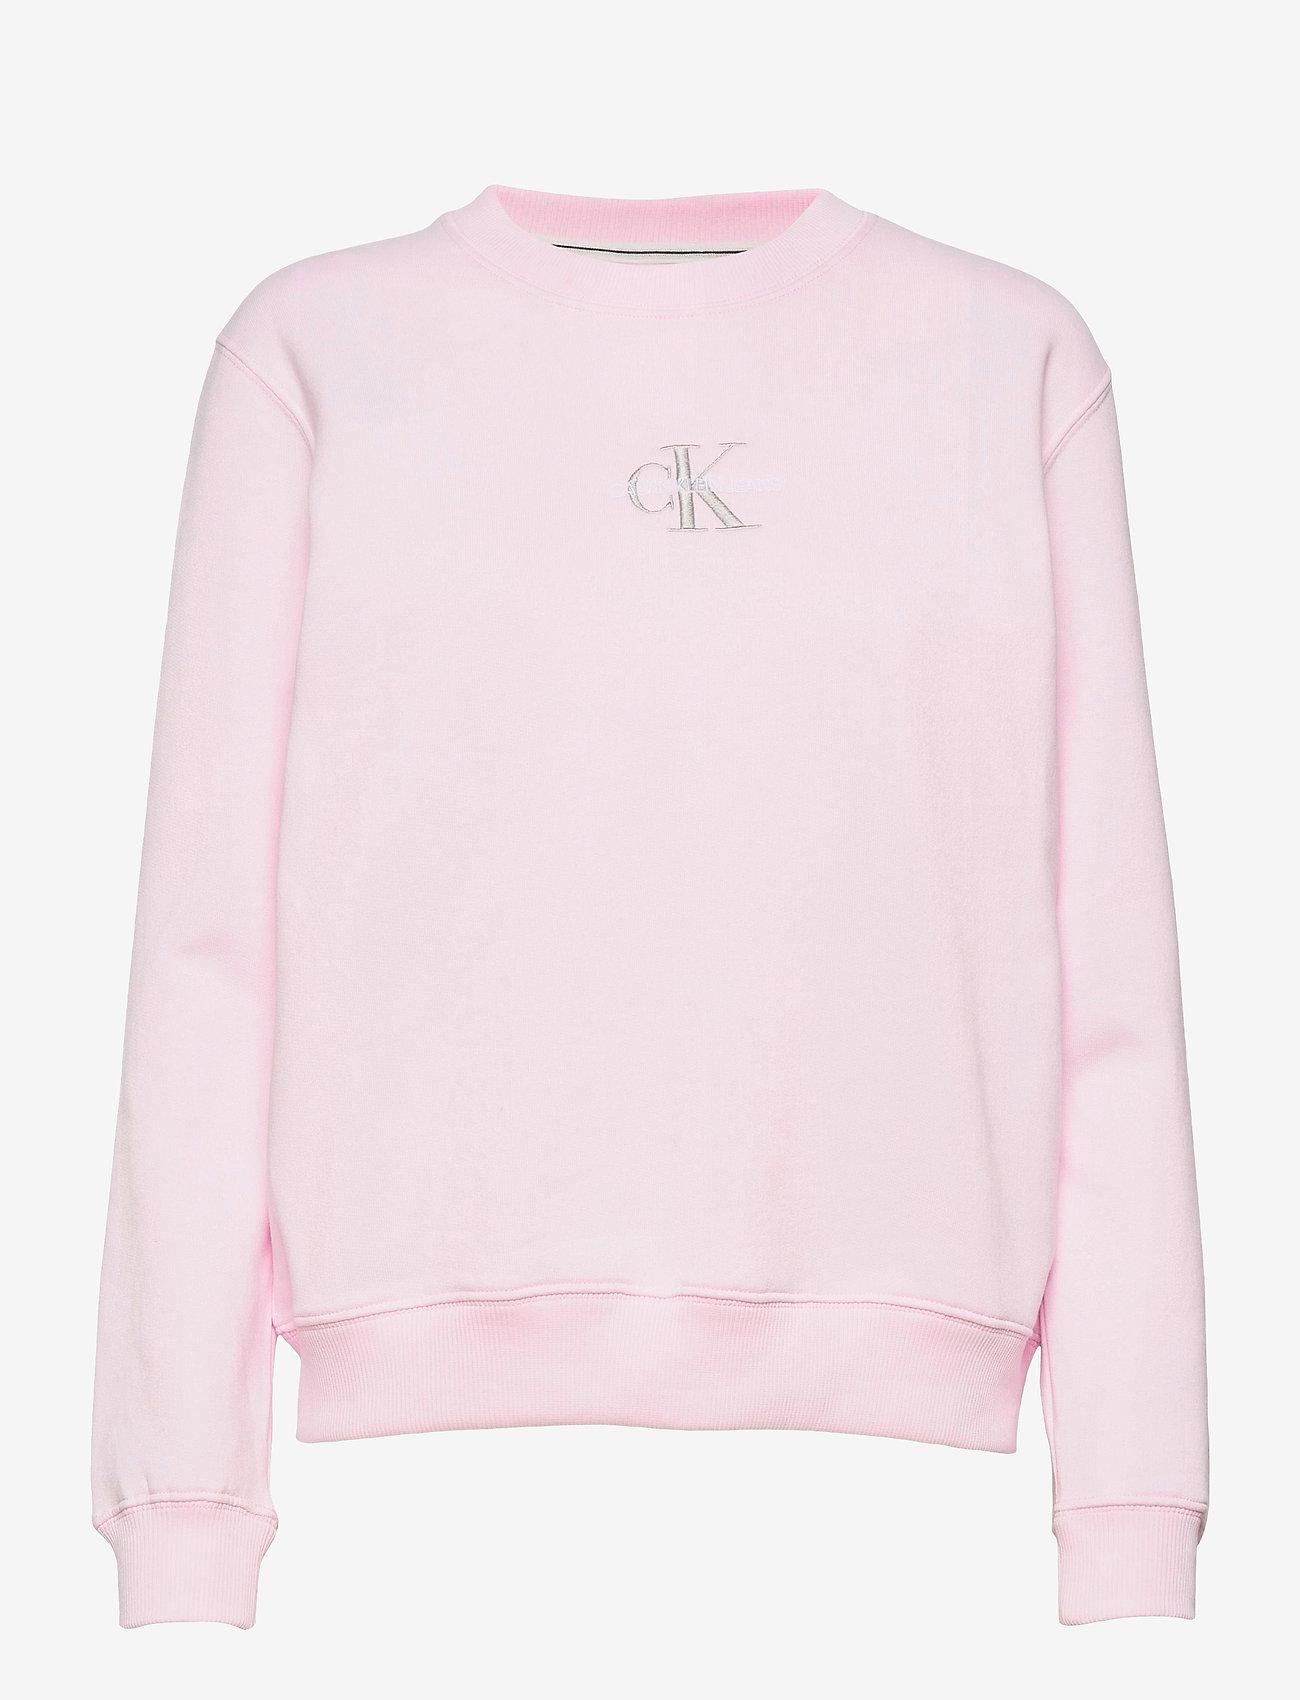 Calvin Klein Jeans - MONOGRAM LOGO CREW NECK - sweatshirts - pearly pink/quiet grey - 0